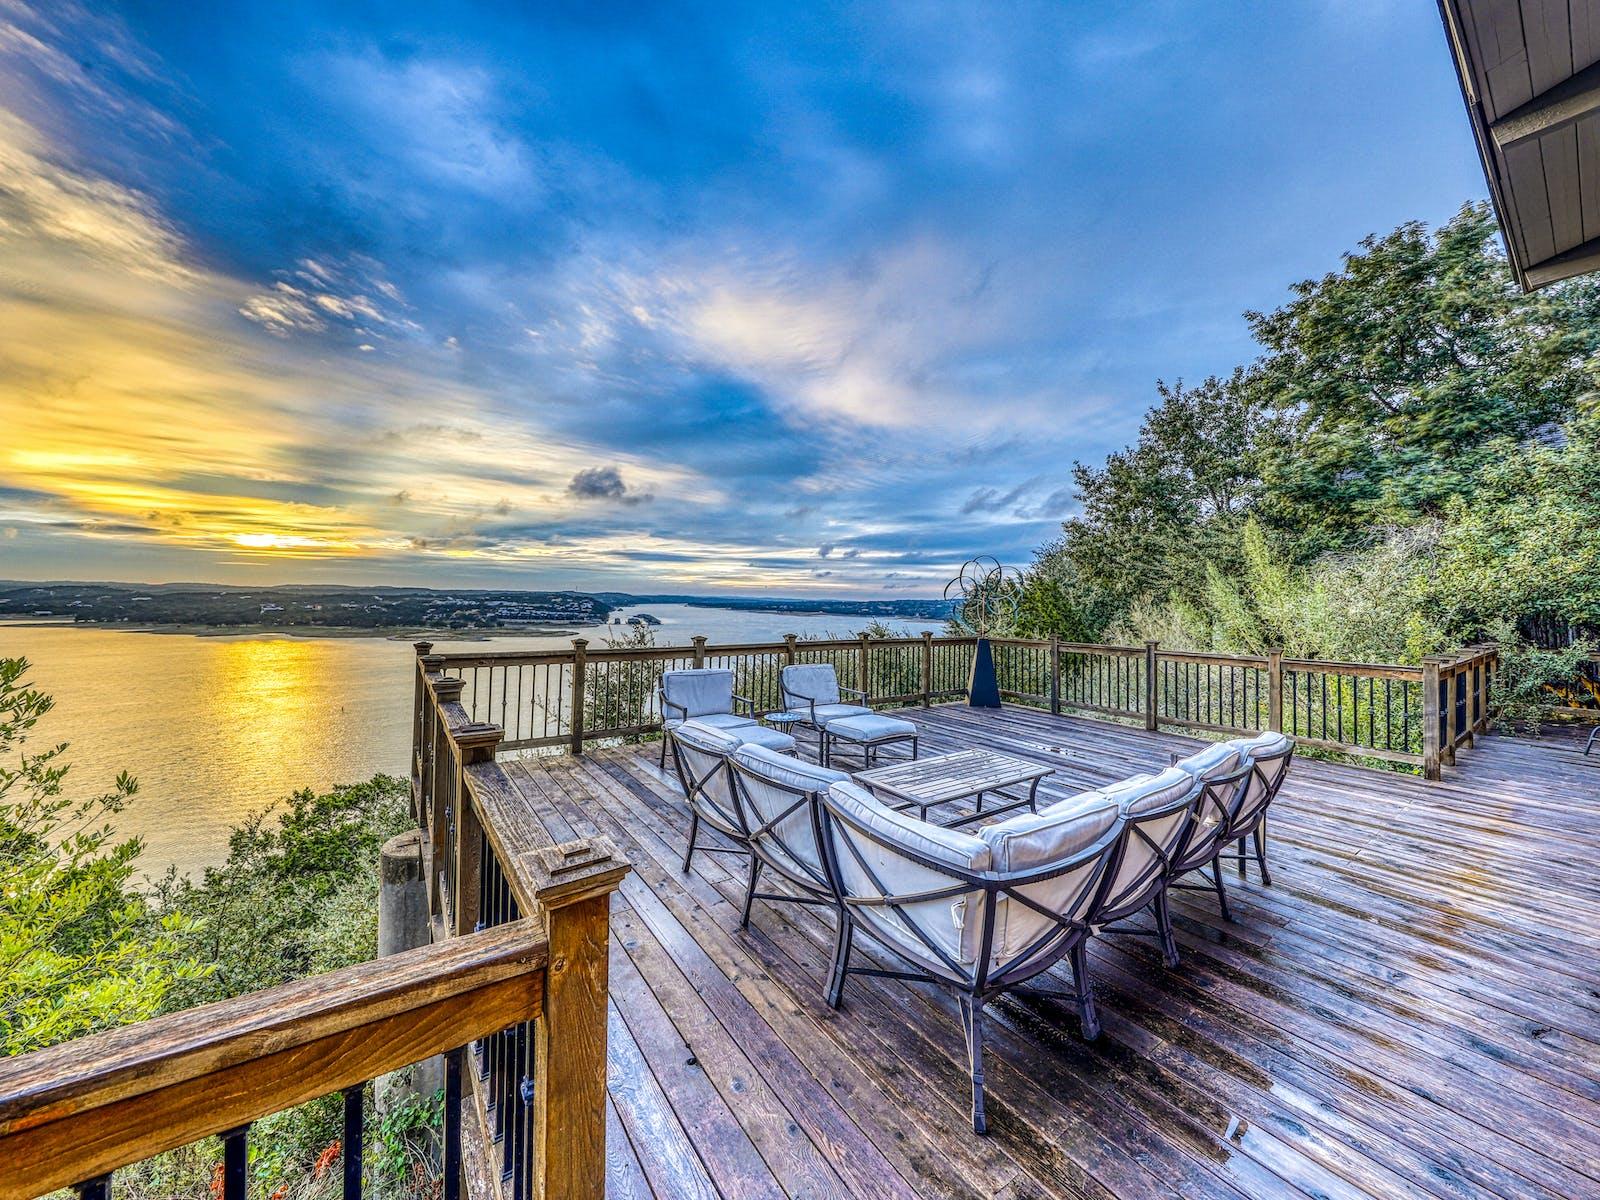 deck of vacation rental overlooking lake in lago vista, tx